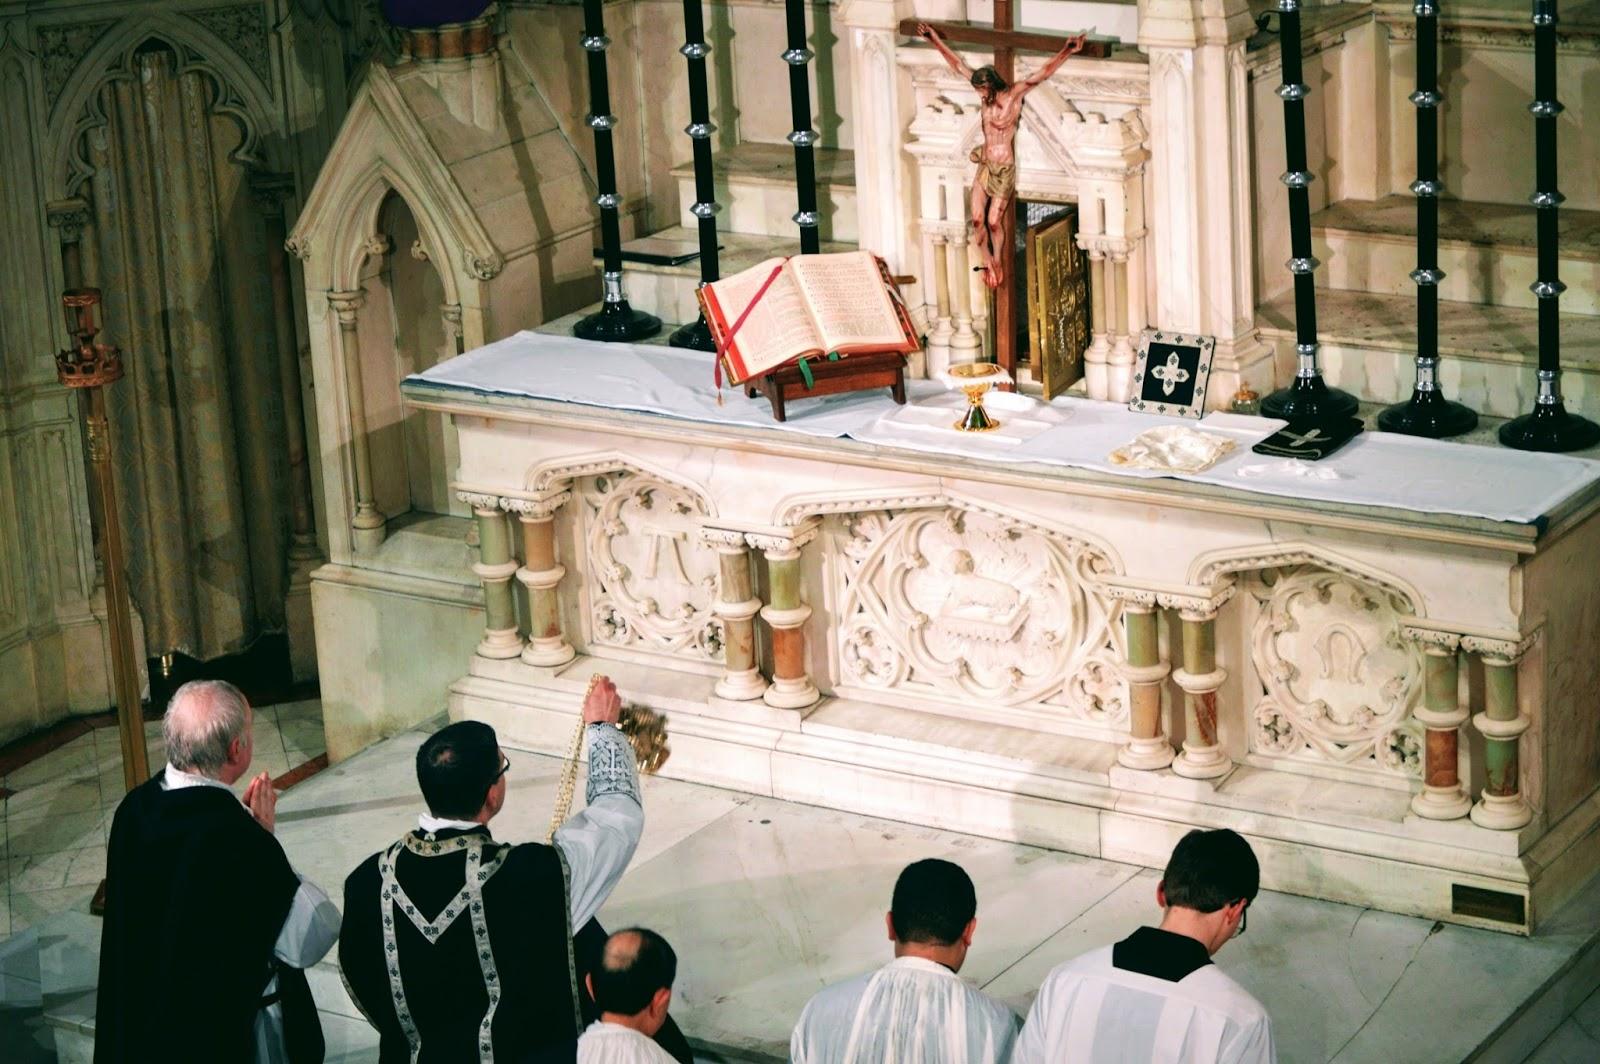 Good Friday 2017 Photopost (Part 2) | Catholic News Live